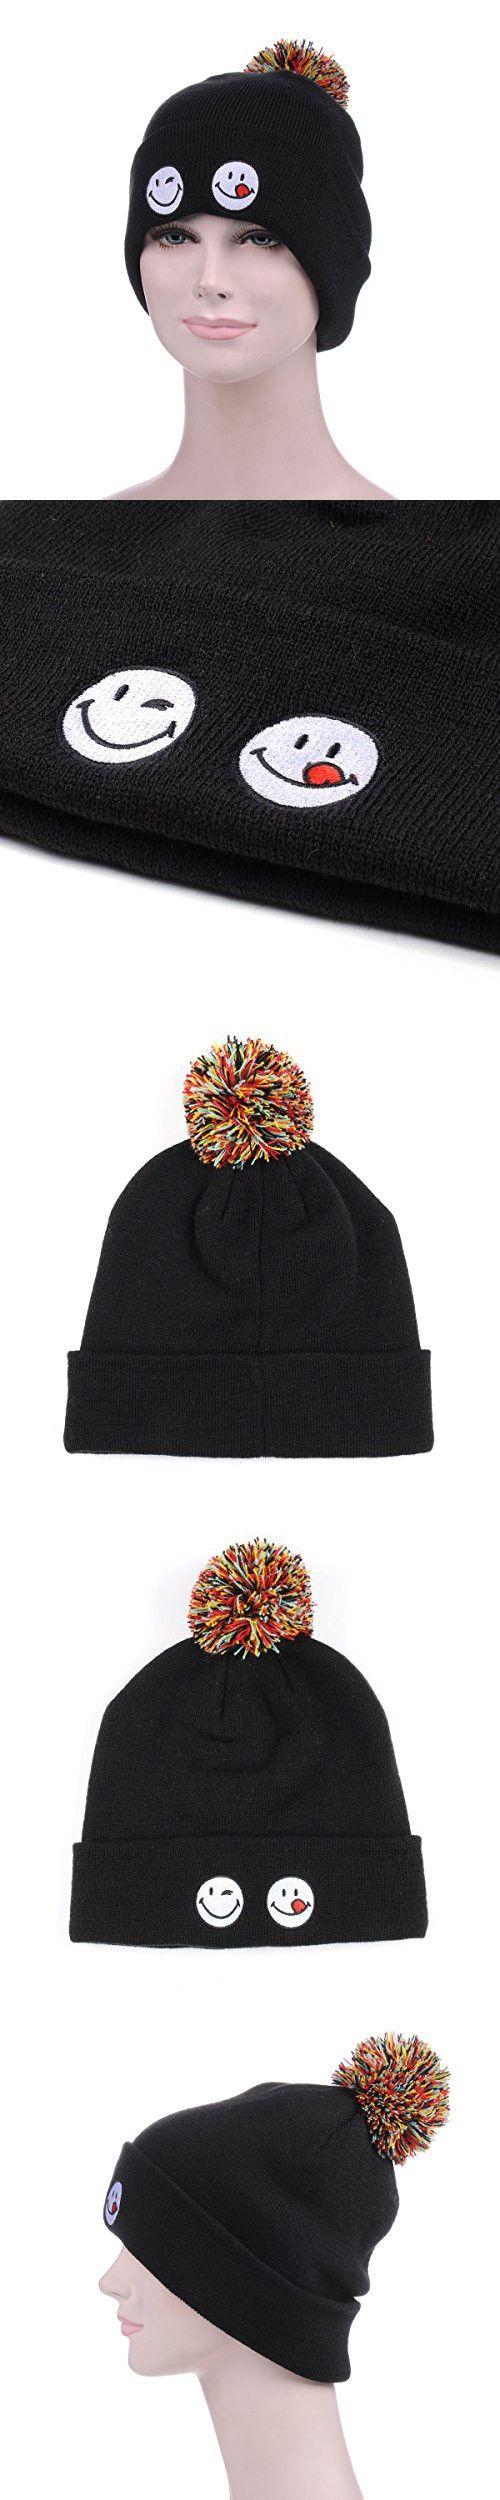 Emoji Smiley Beanie for Women Girls Men Pom Cuff Black Winter Slouchy Knit Hats - Unisex Daily Soft Stretch Warm Trendy Thick Hip Hop - Best for Sports, Outdoors, Hiking, Ski